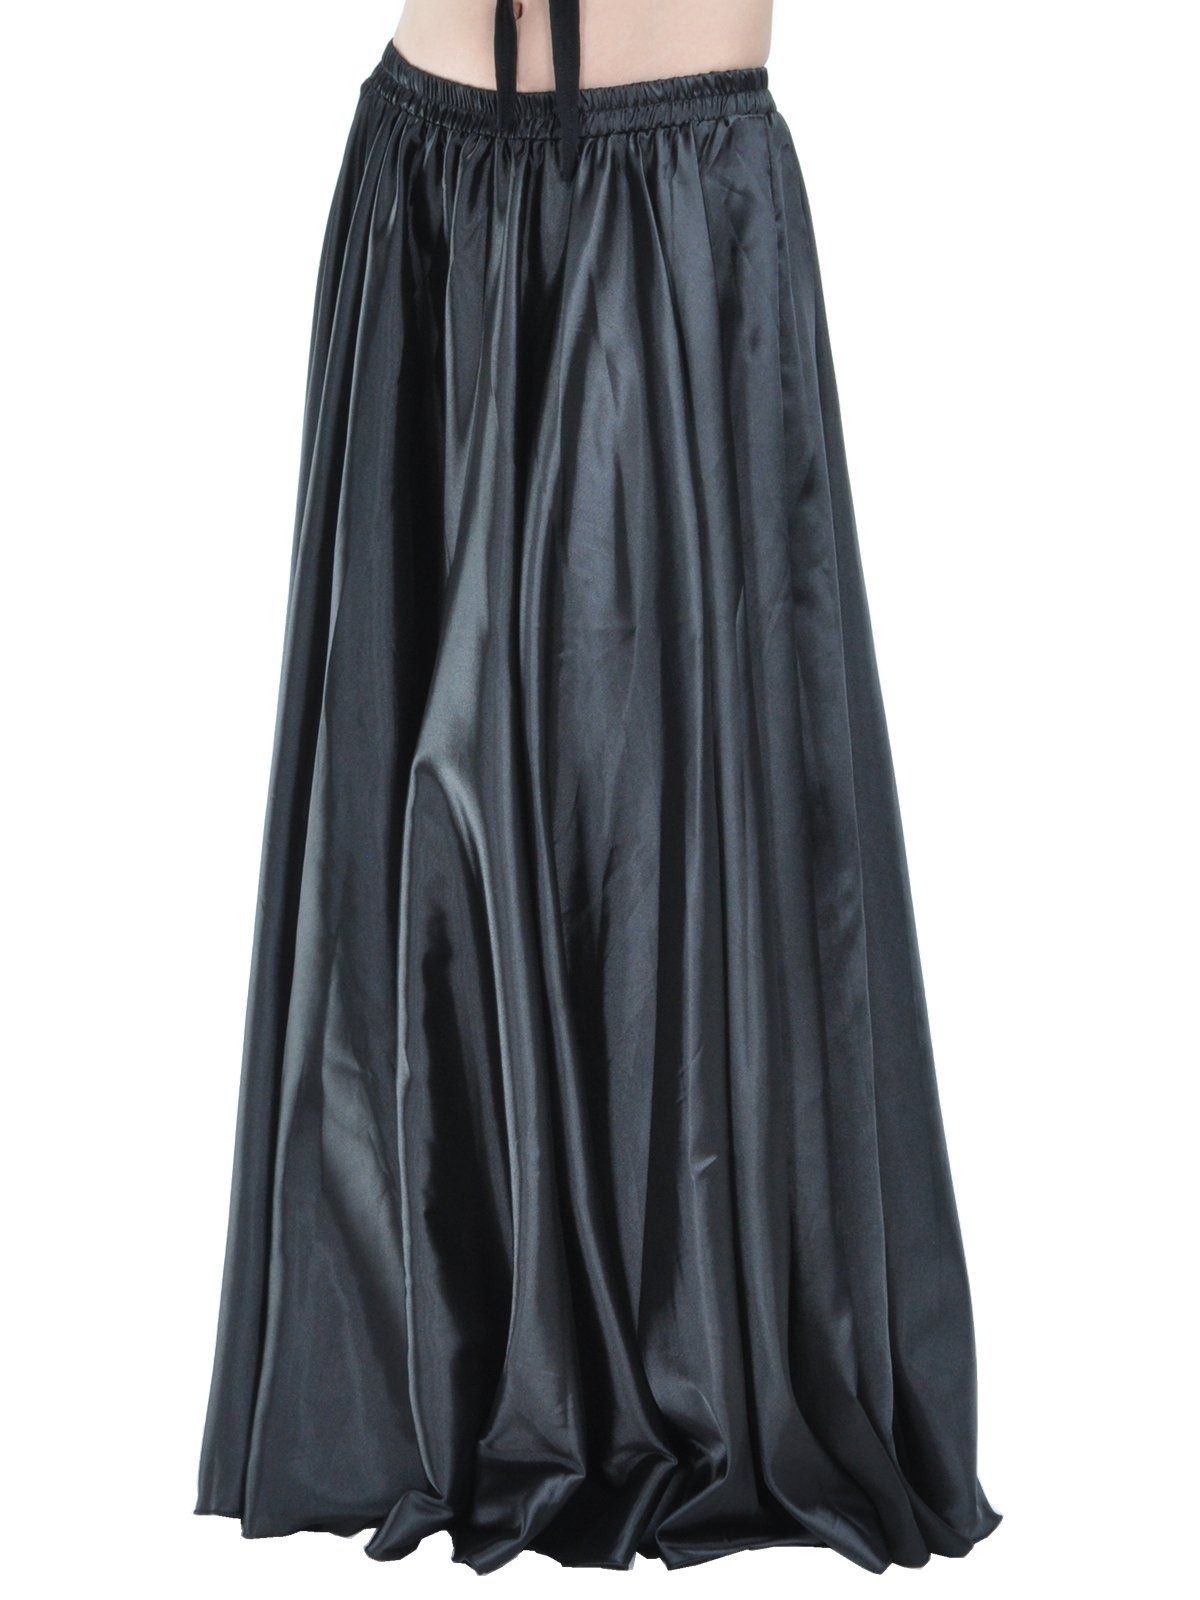 low priced 3b0b3 14361 $22 Dance Fairy Black Satin Long Skirt Full Circular Swing ...